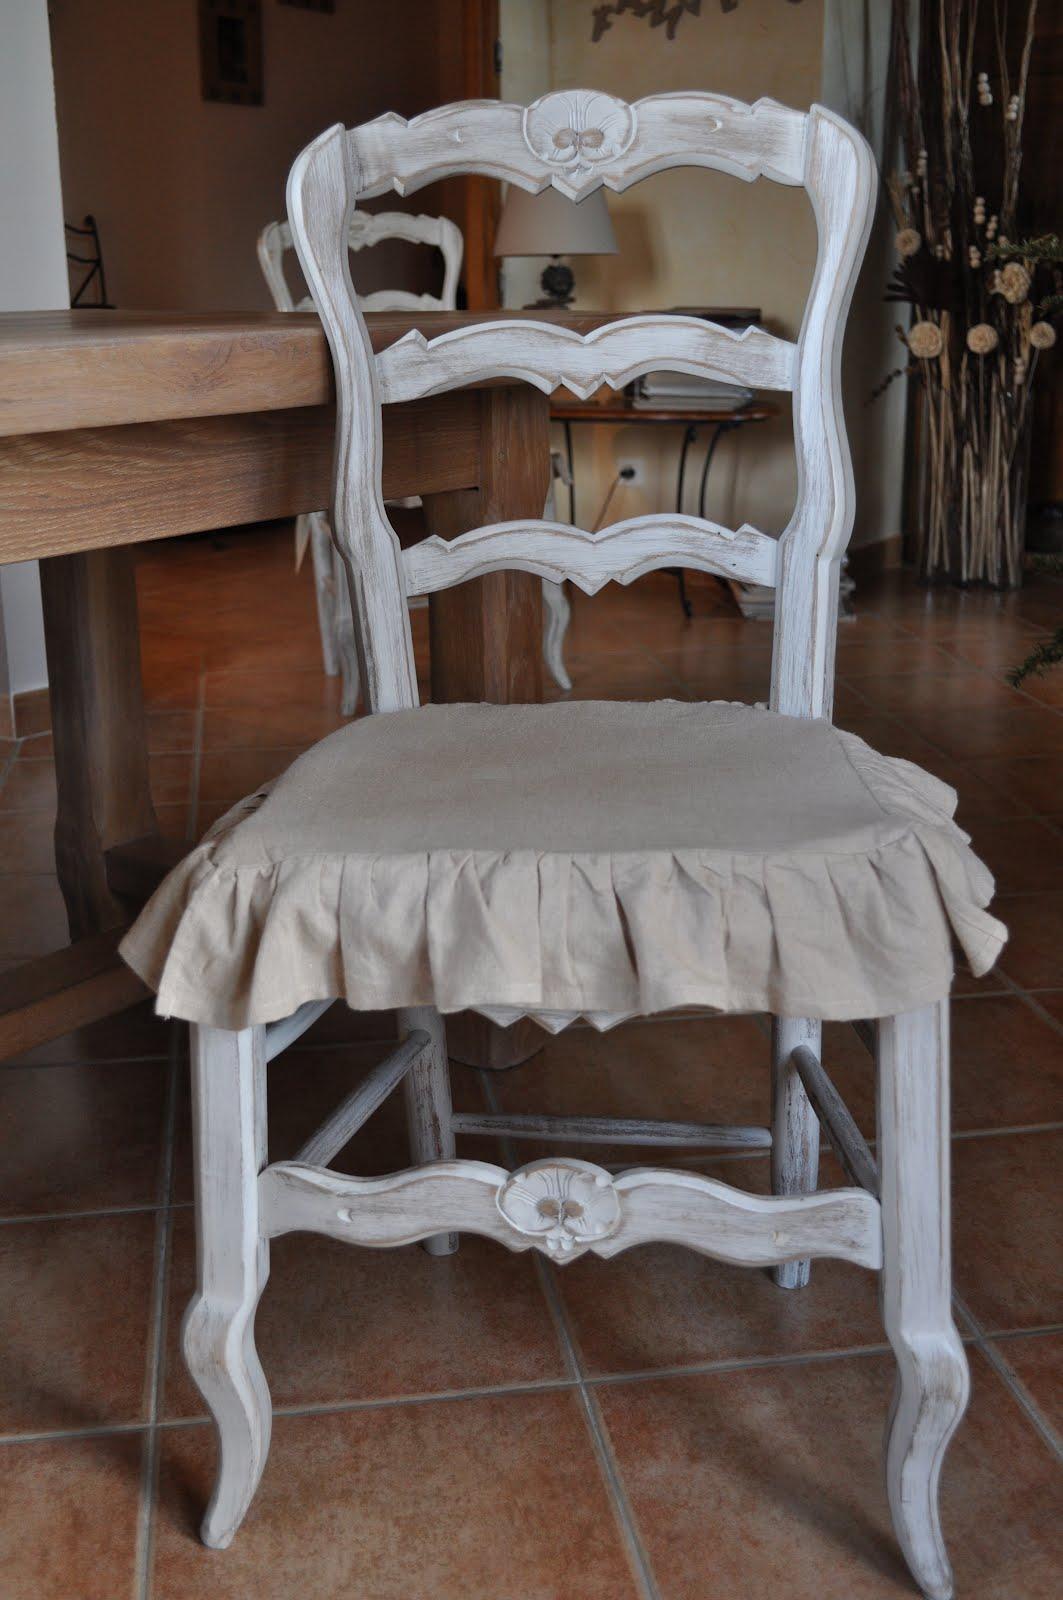 bois et patines nathalie madrenes rajeunir des chaises style campagnard. Black Bedroom Furniture Sets. Home Design Ideas